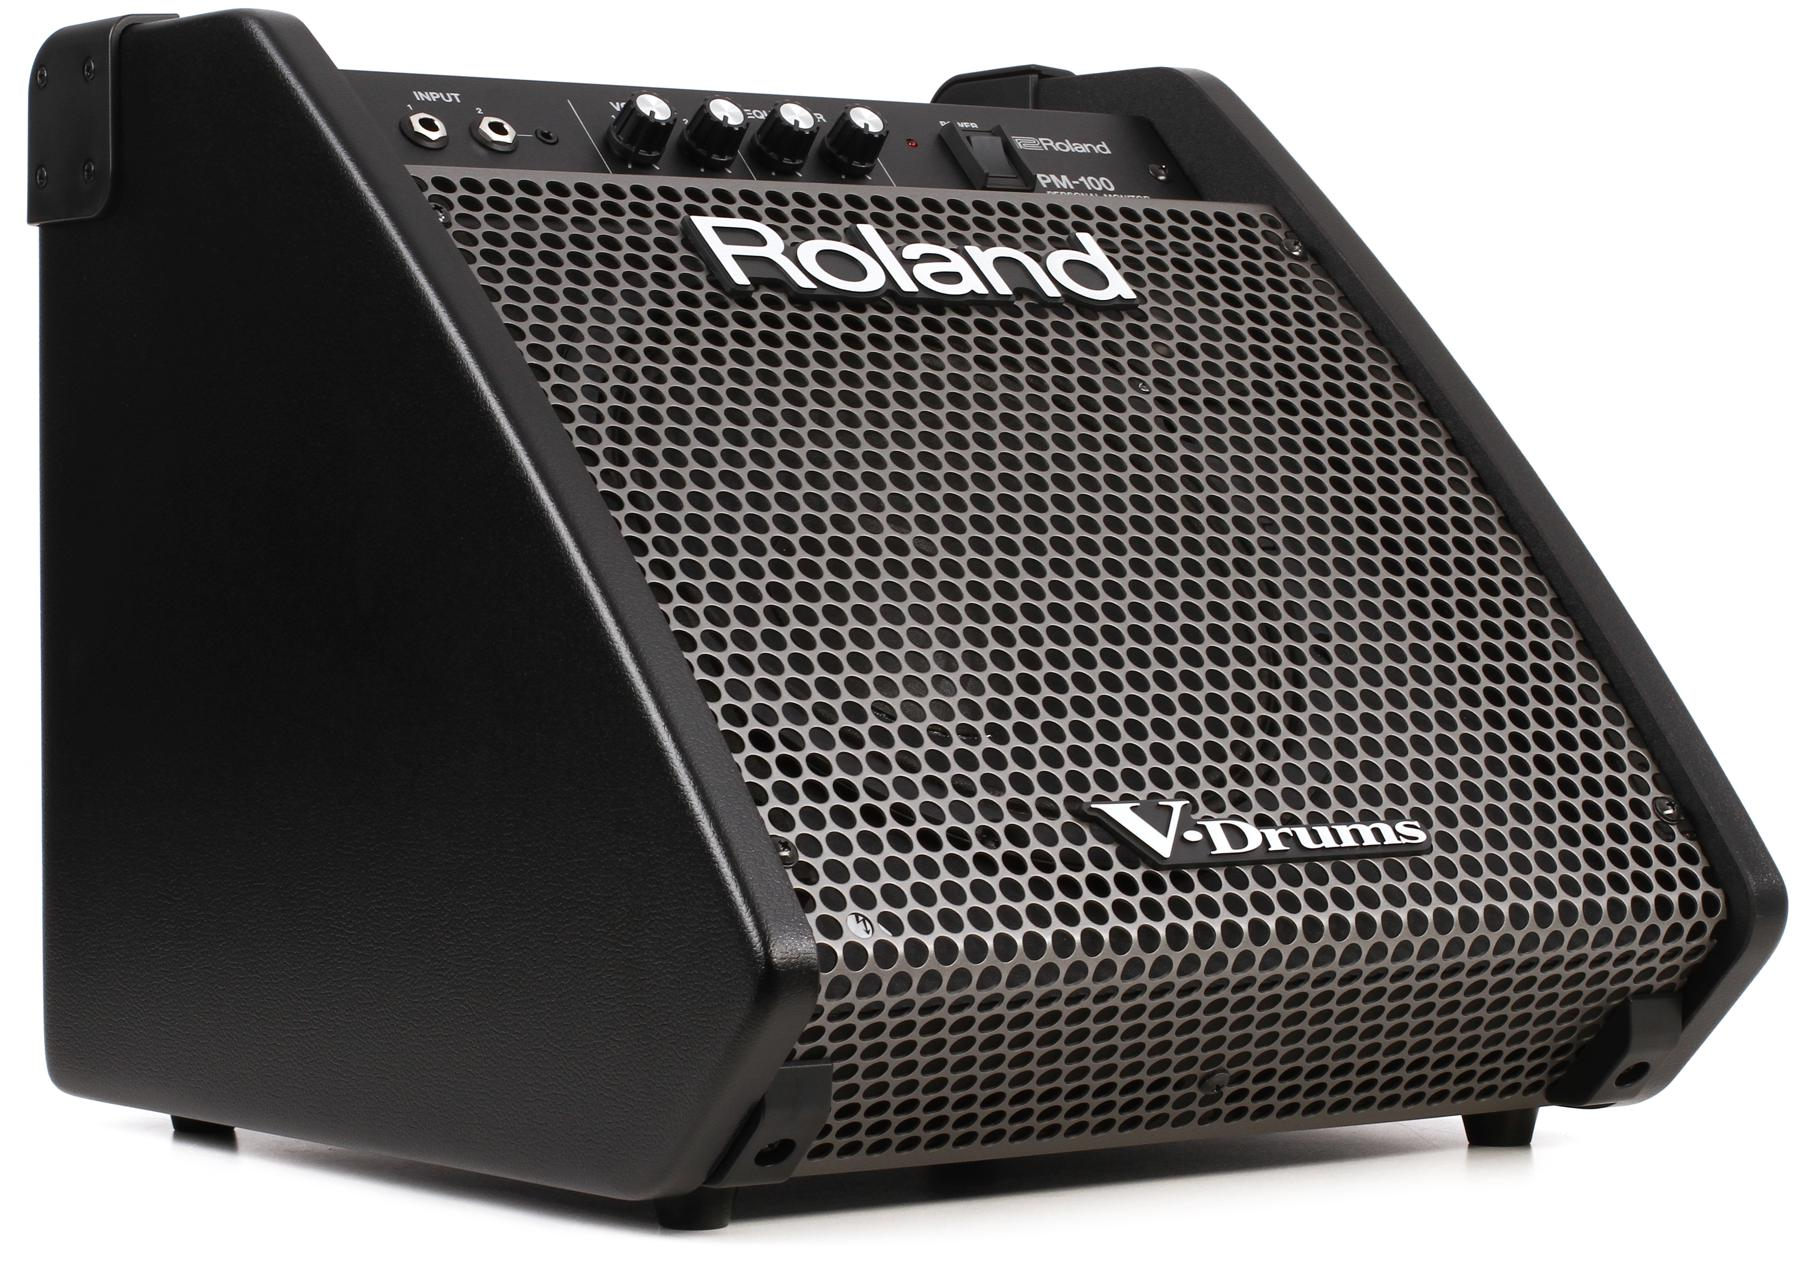 2. Roland PM-100 Drum Monitor